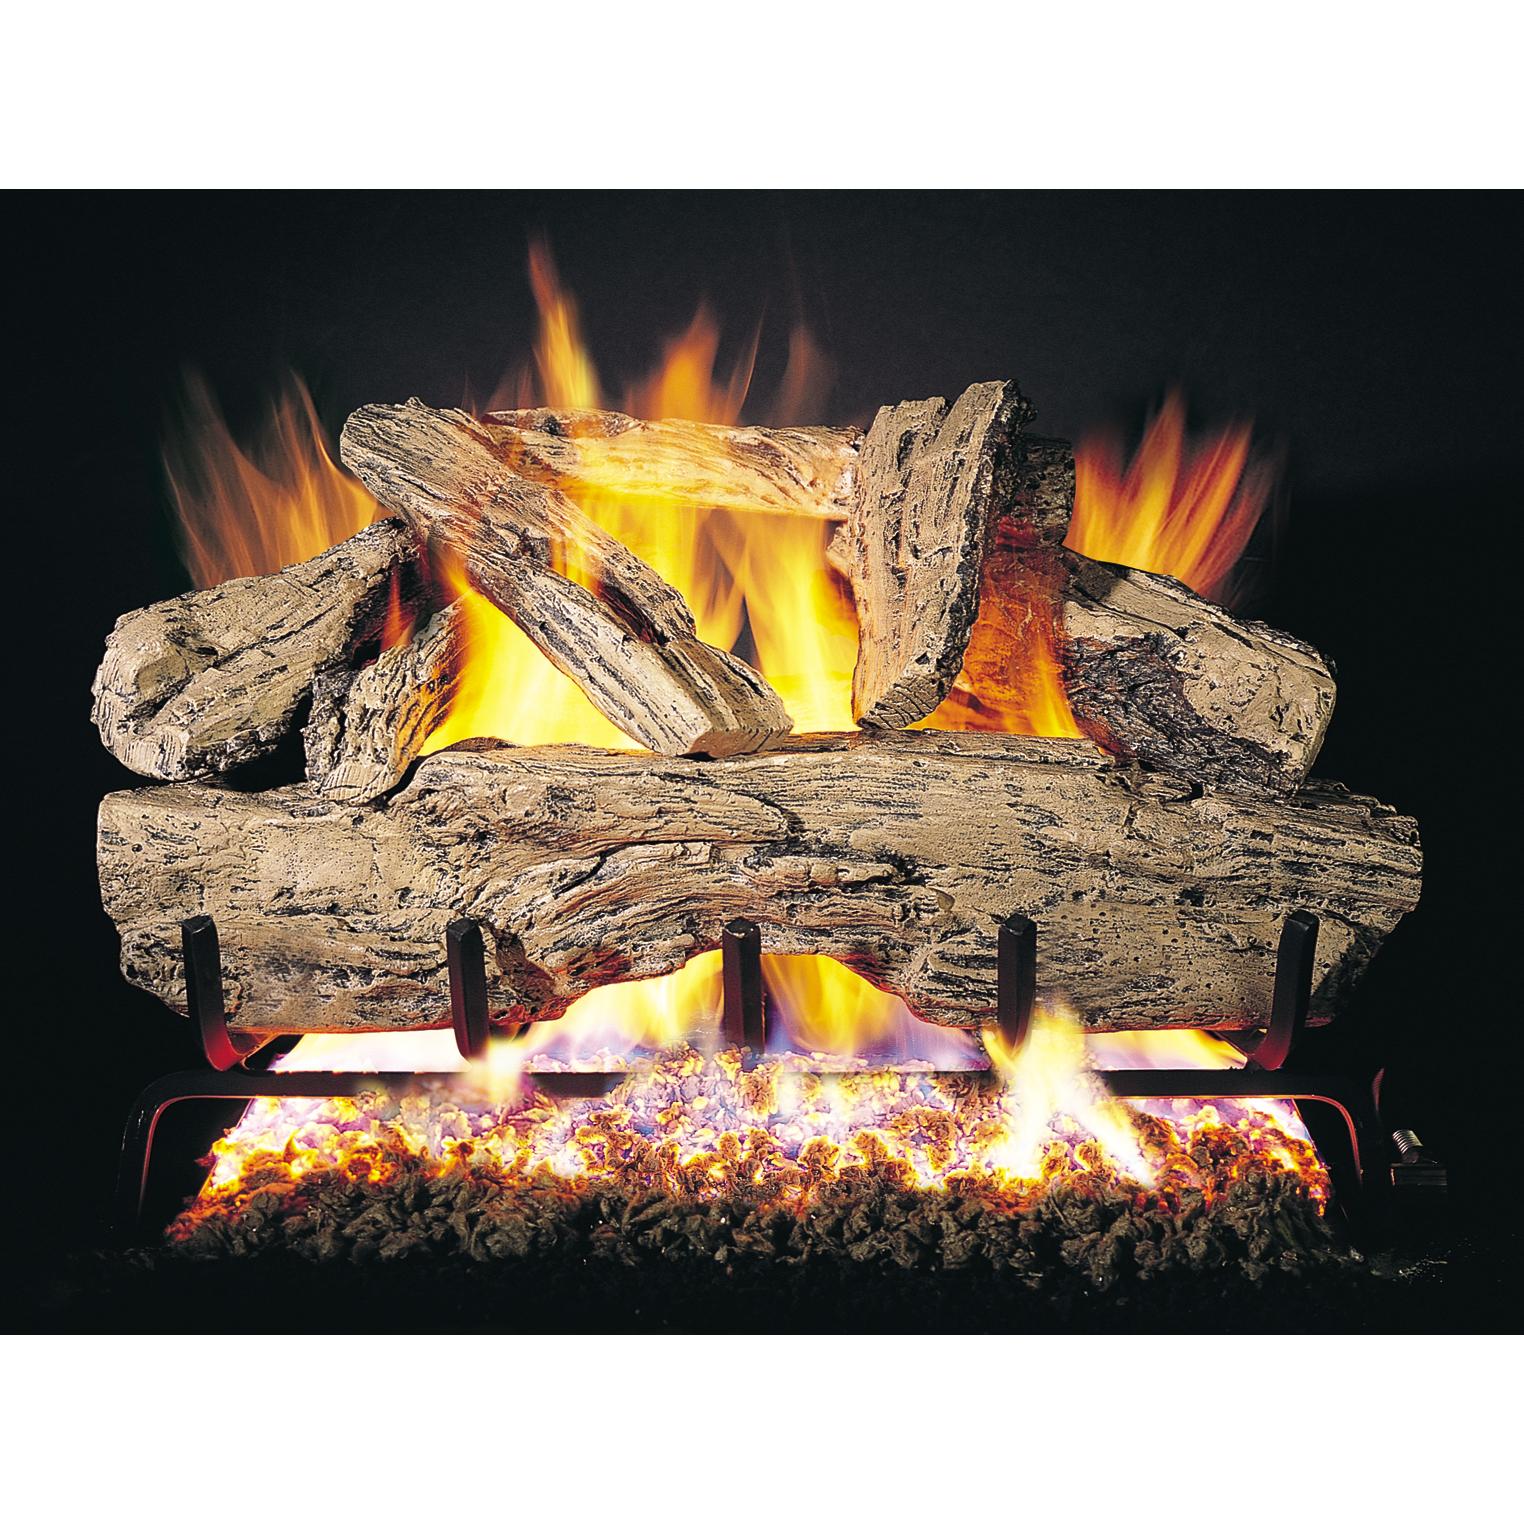 Desert Fireplaces & BBQ's (Palm Desert Fireplaces)